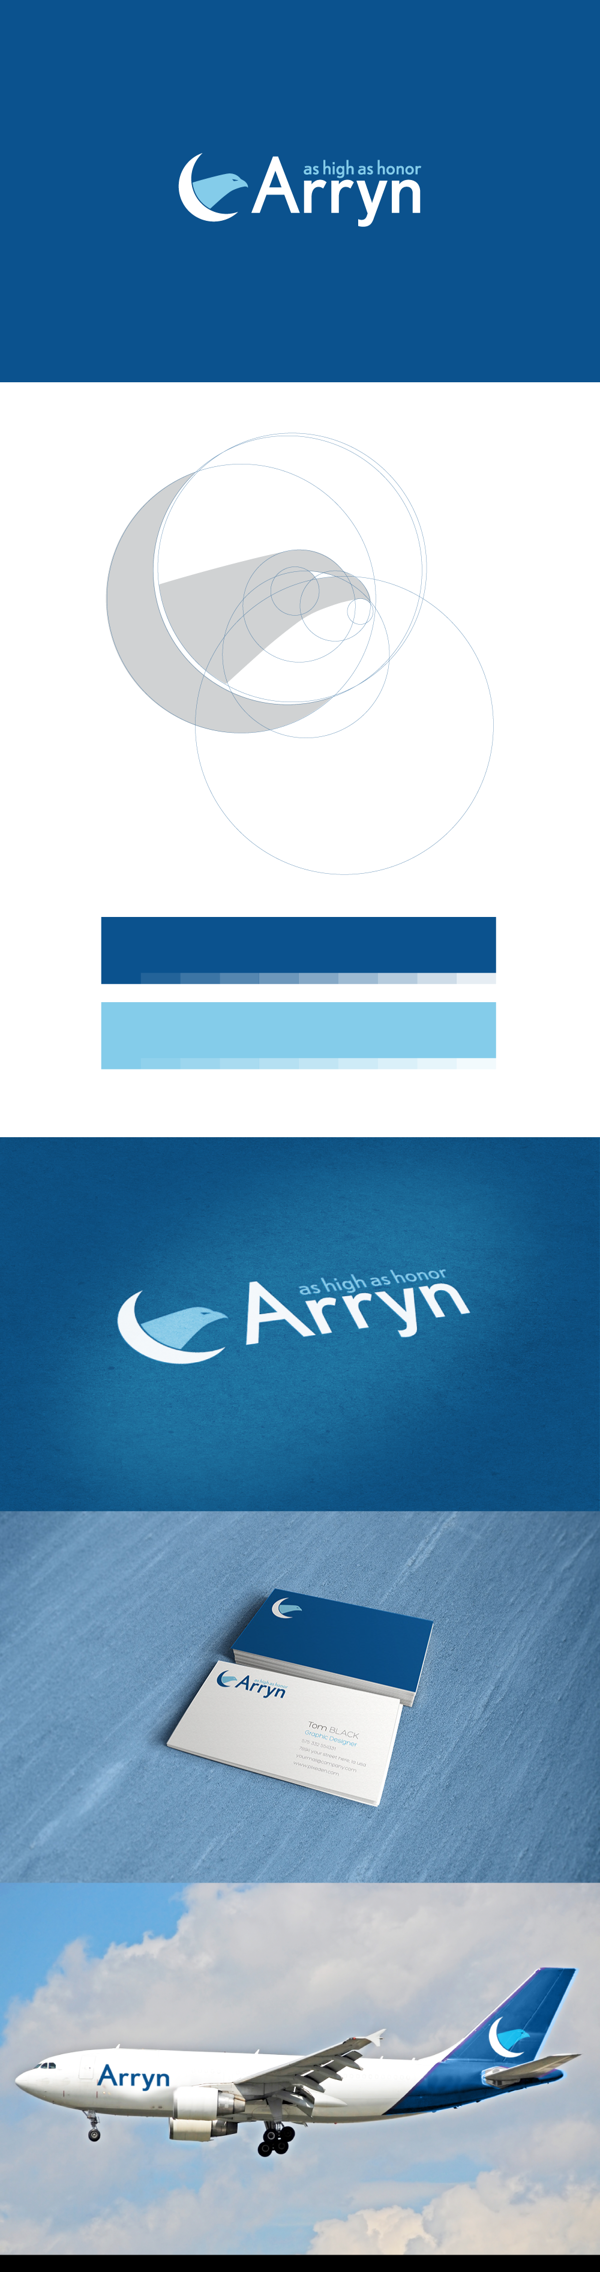 arryn-got-sbh-le-news